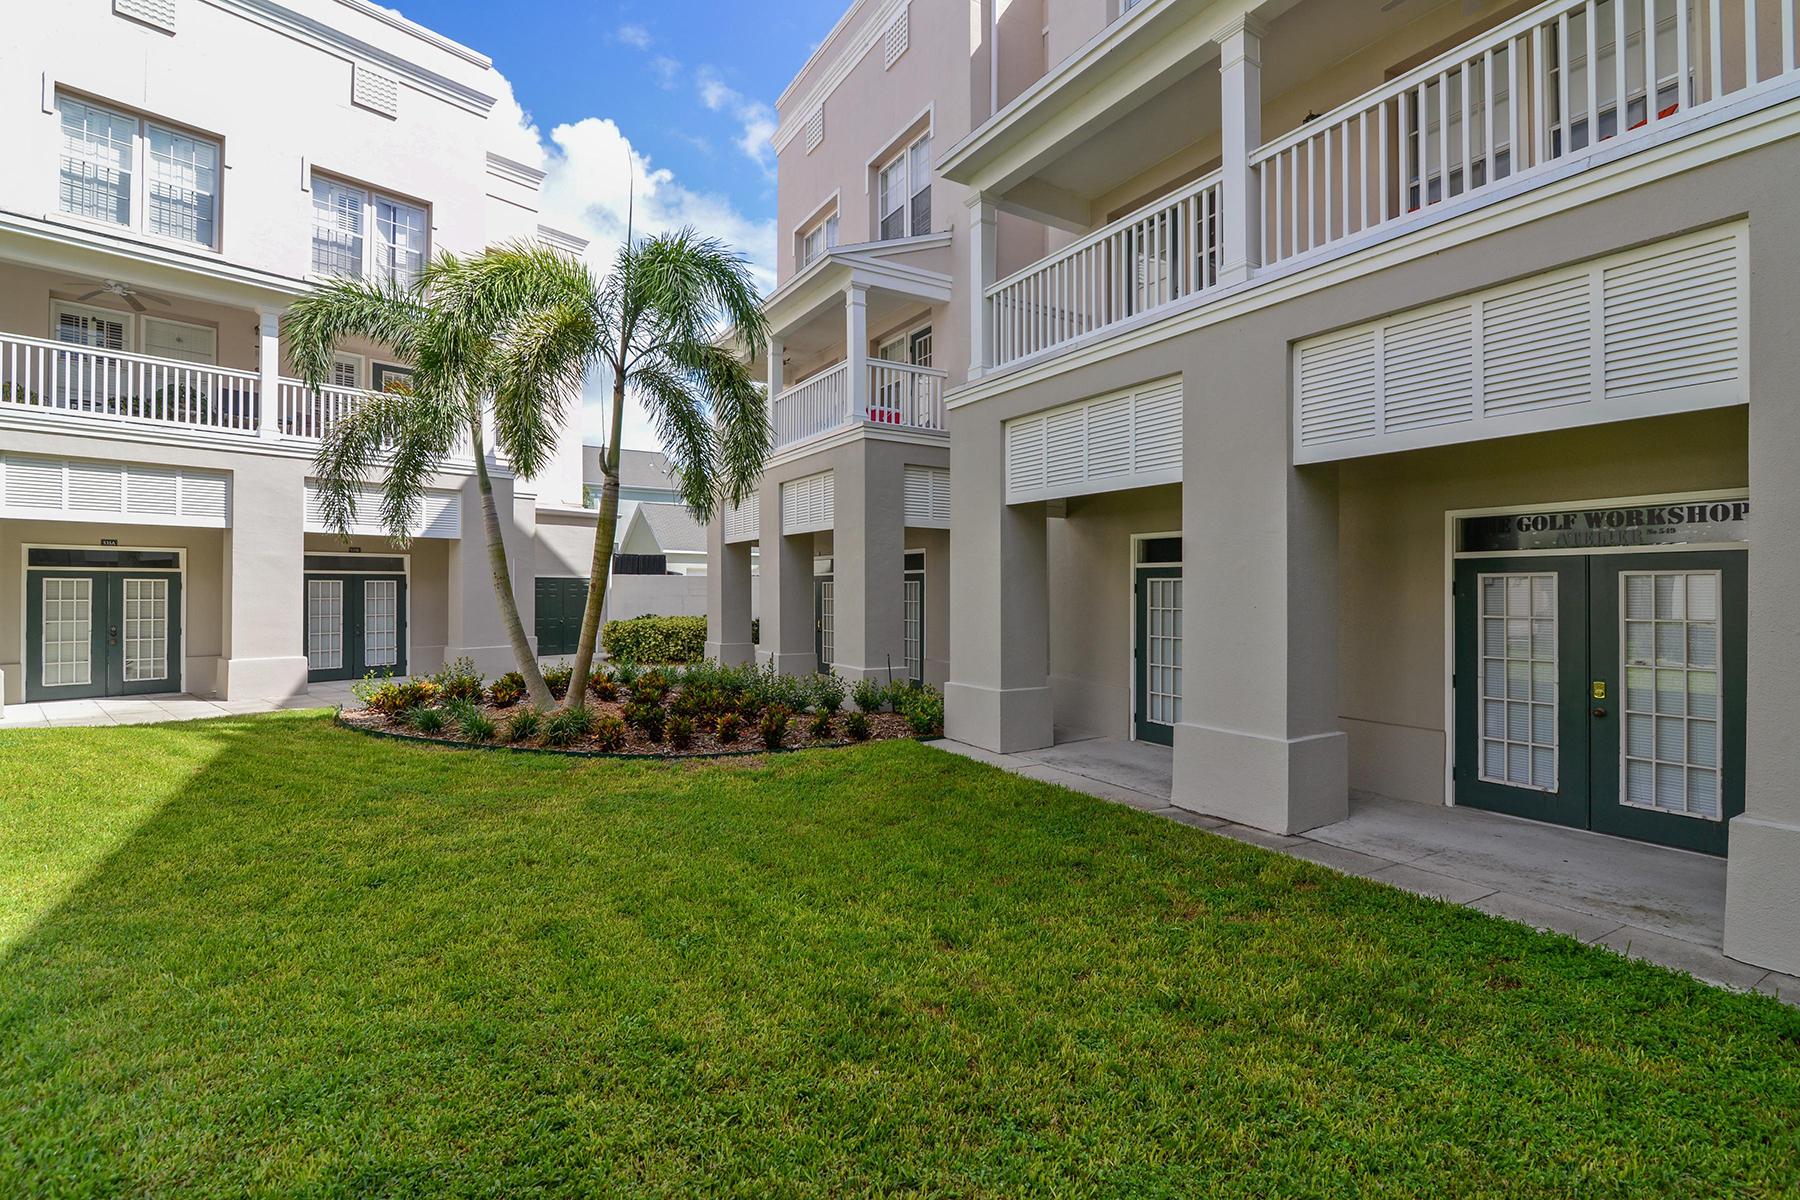 Condominium for Sale at CELEBRATION 579 Water St 579 Celebration, Florida, 34747 United States